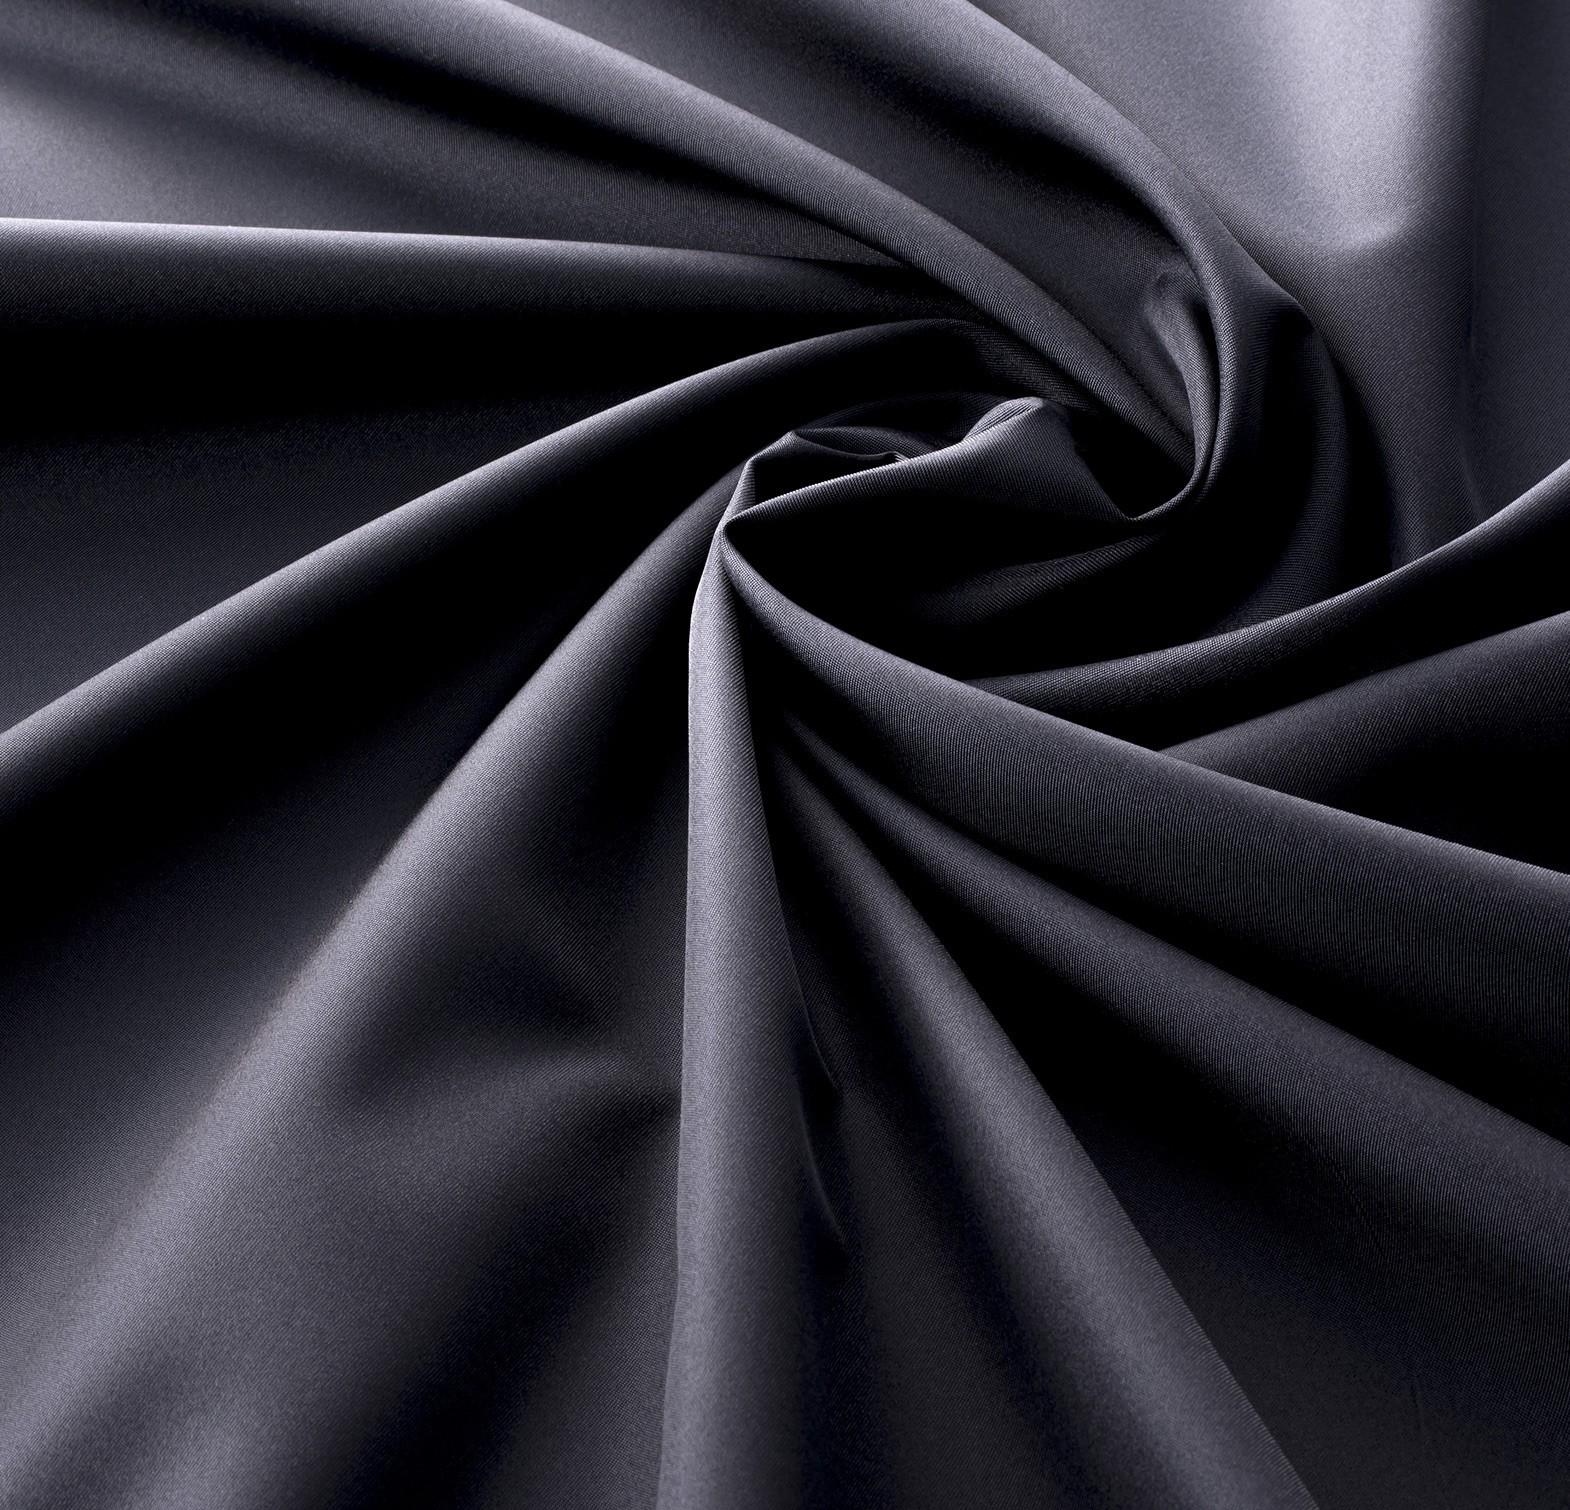 Nappage & textile